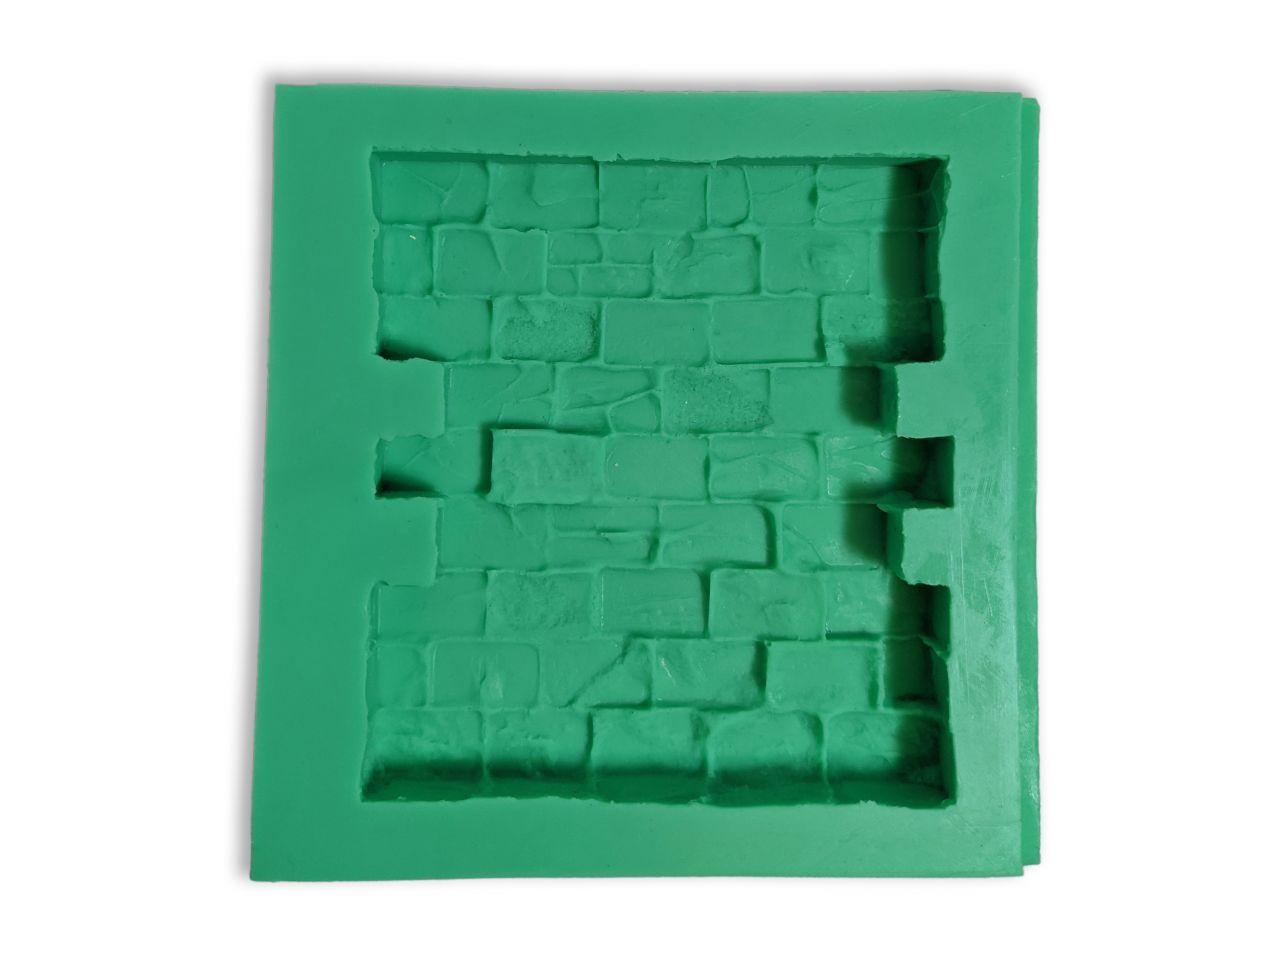 Giessform Silikonform Mauer Modul Wand Krippenbausteine Set 11